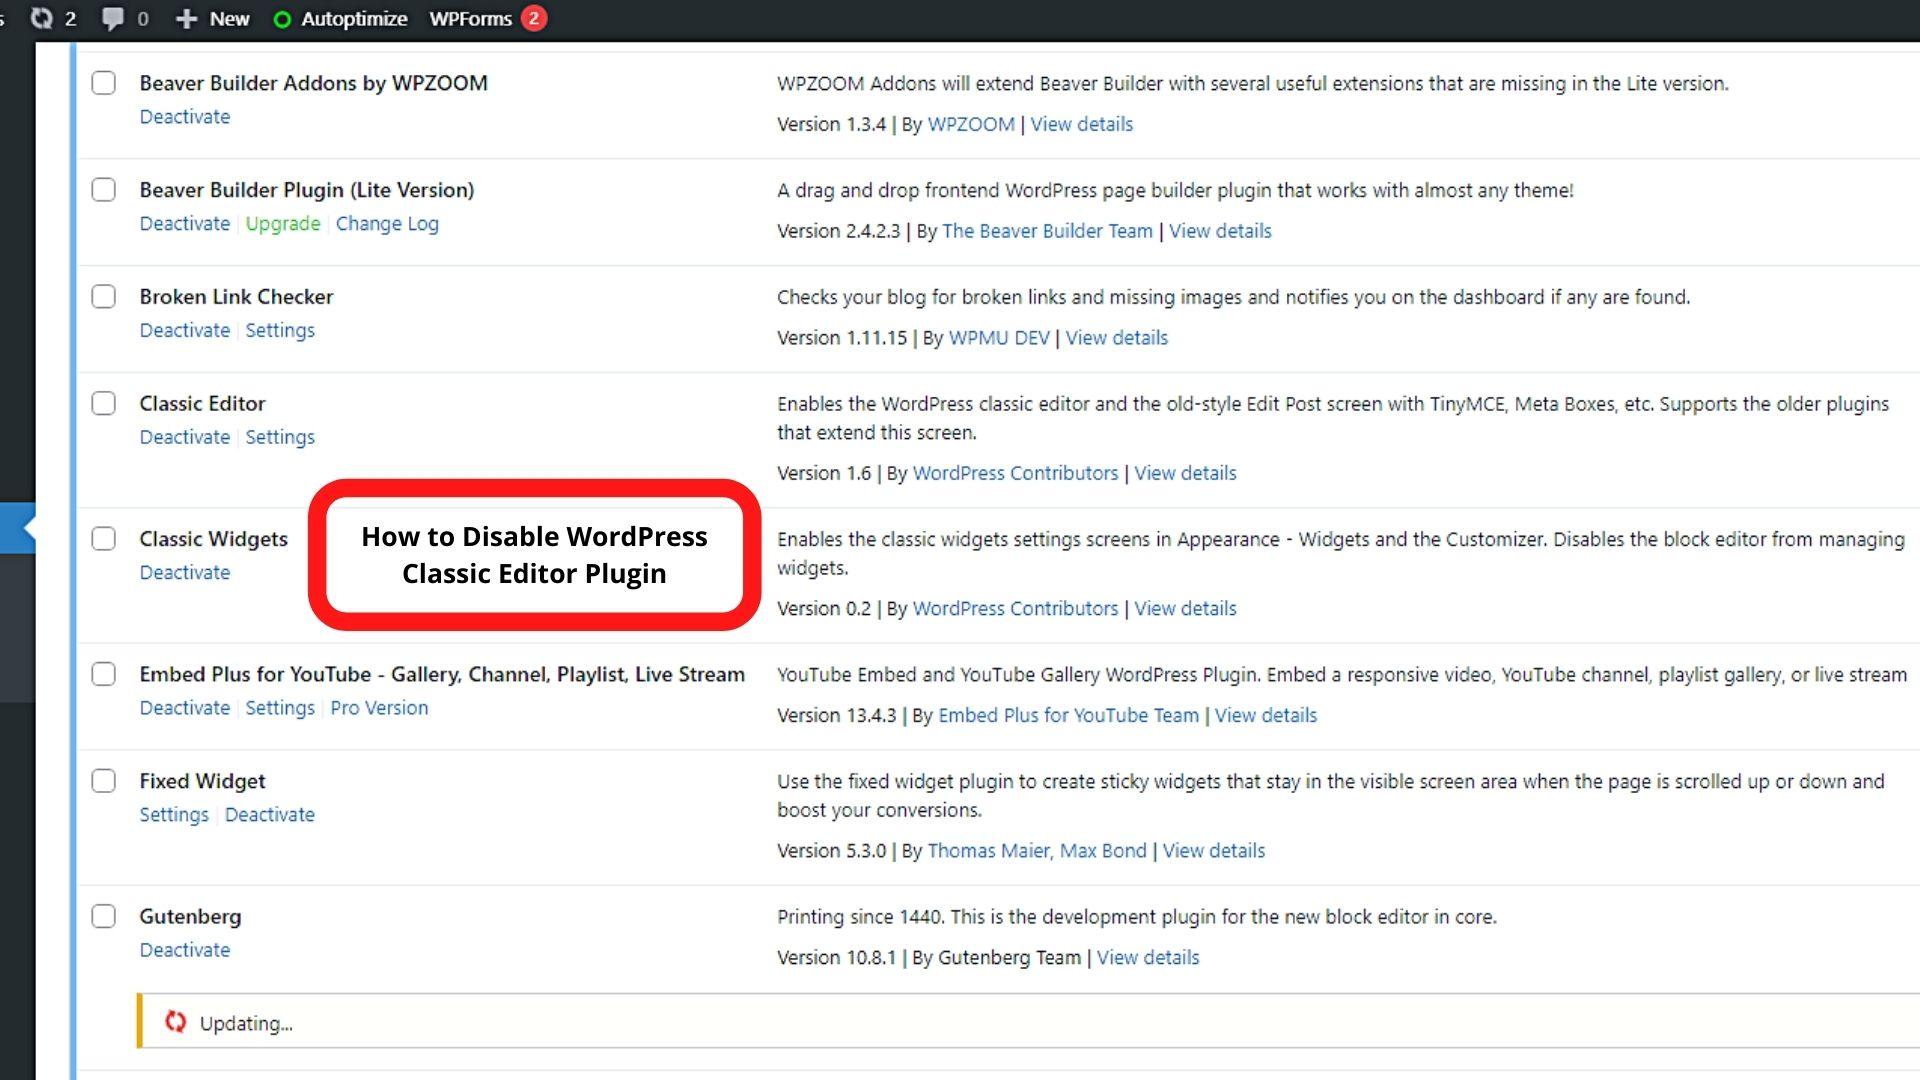 How to Disable WordPress Classic Editor Plugin